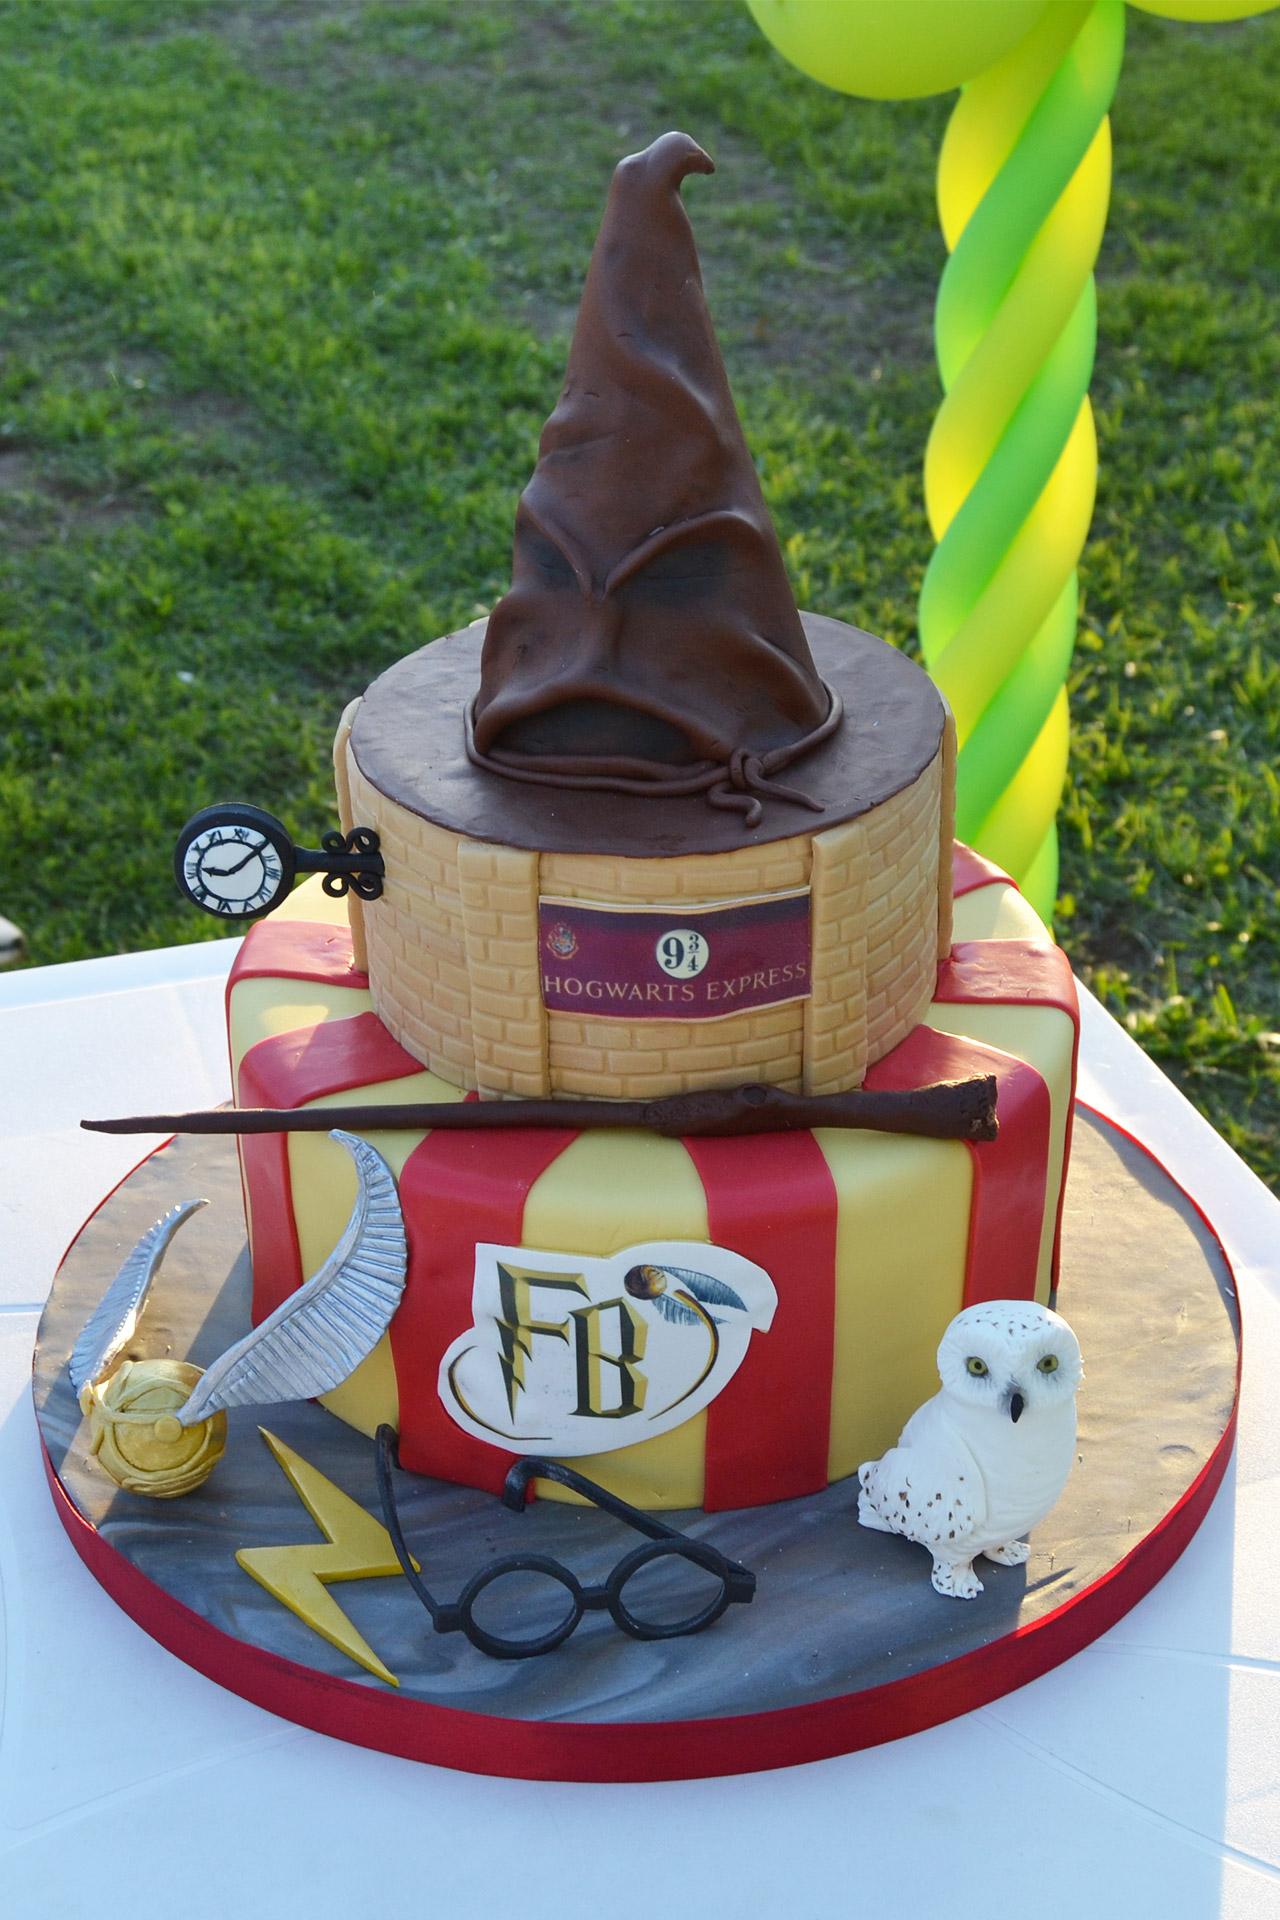 Harry Potter Party - Cake